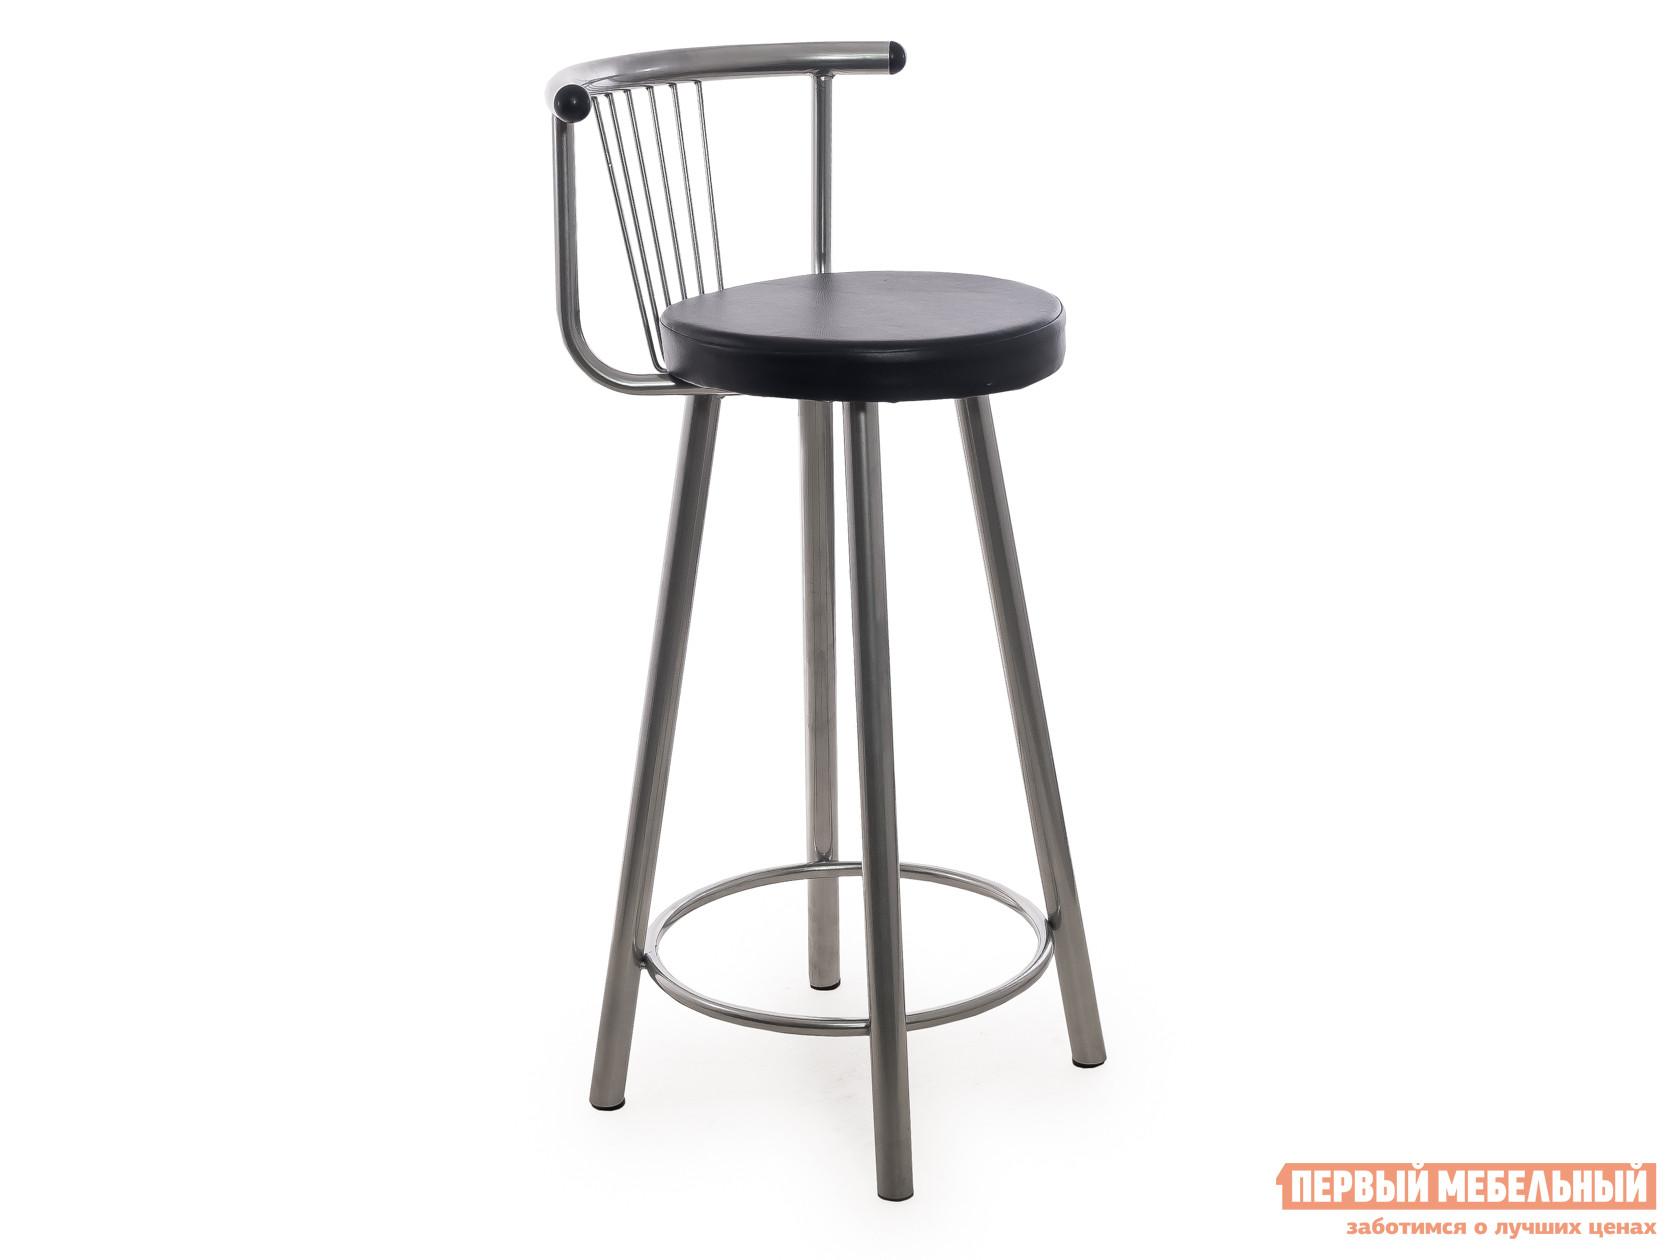 Барный стул Амис Барный Стиль Черный